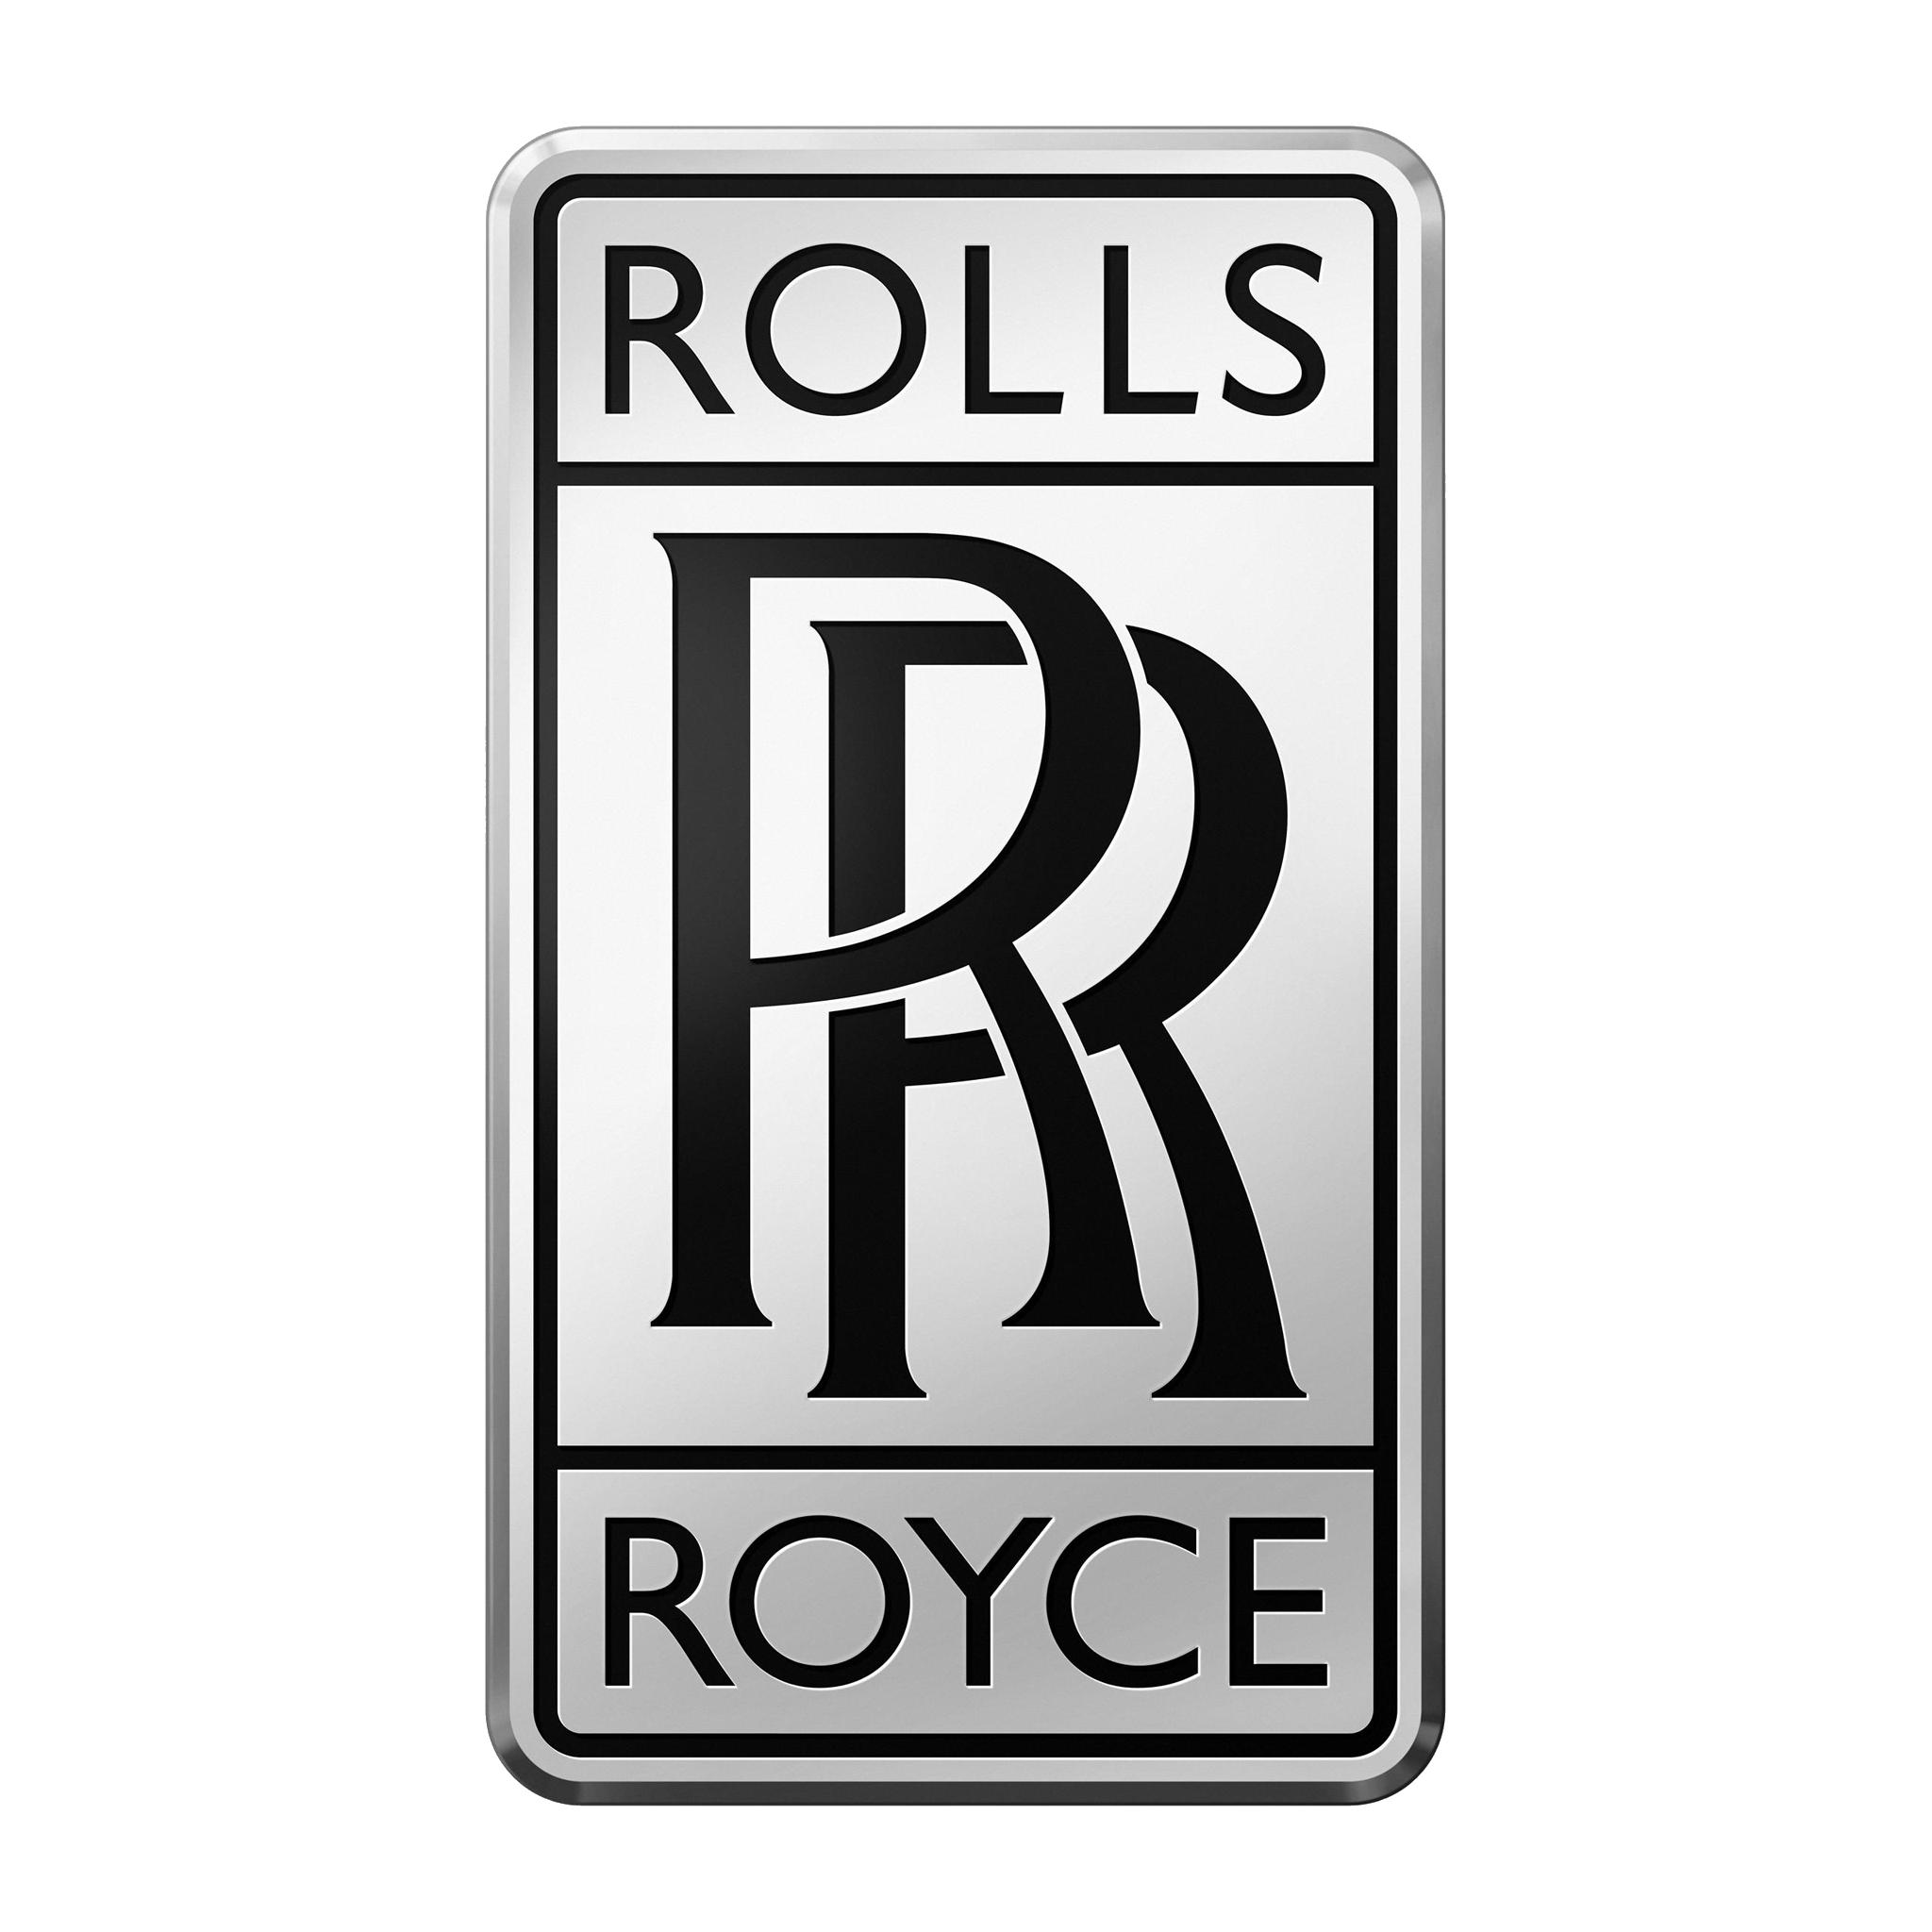 Rolls-Royce-Motor-Cars-logo-768x1024.png